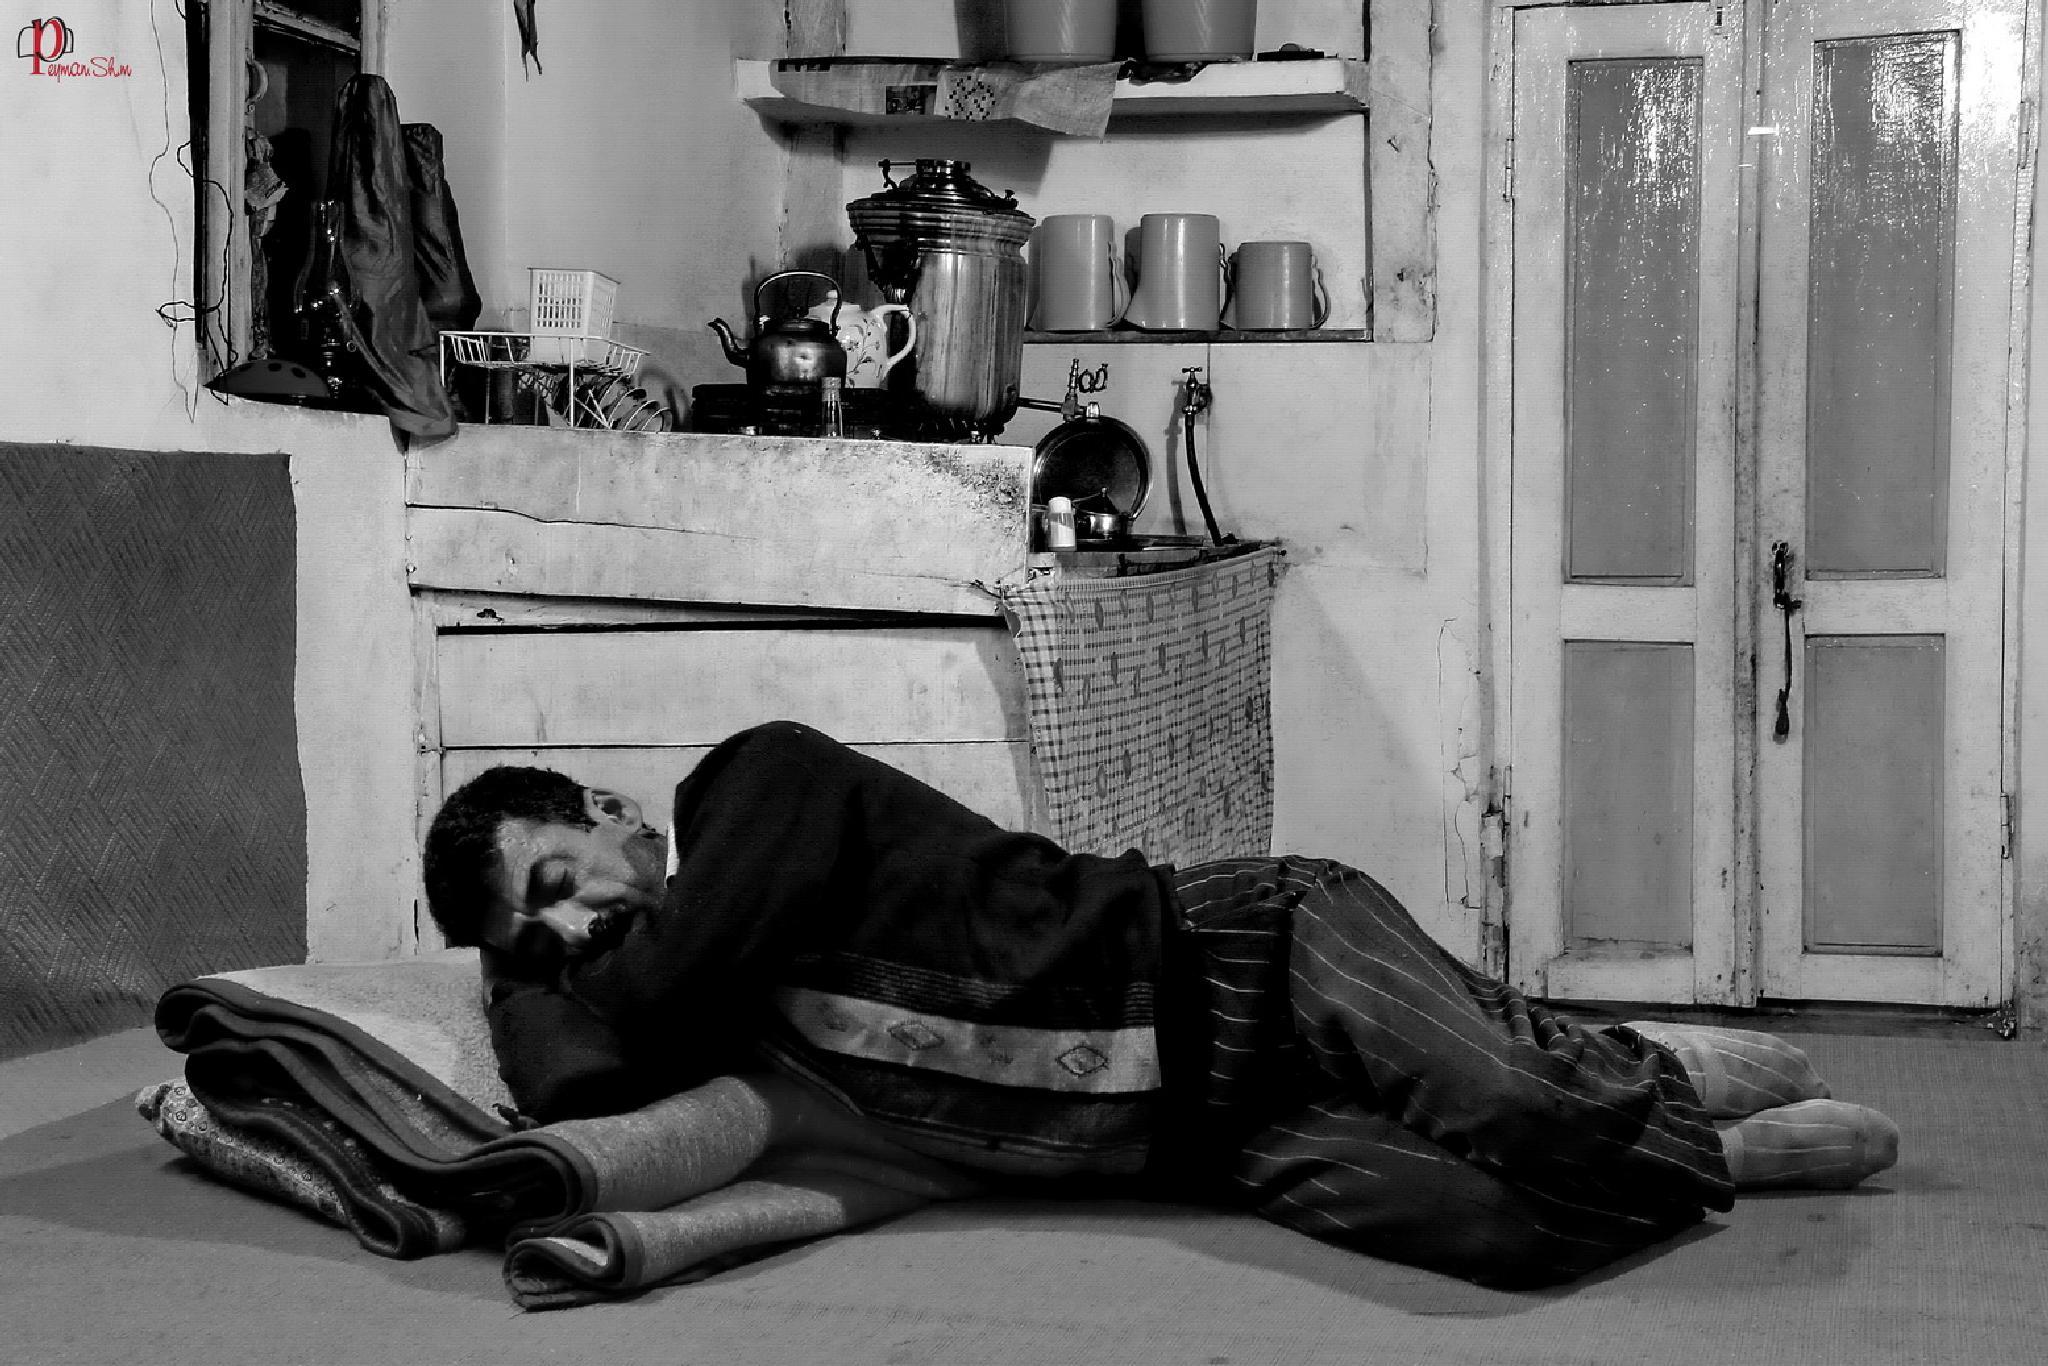 Sleep by Peyman shm